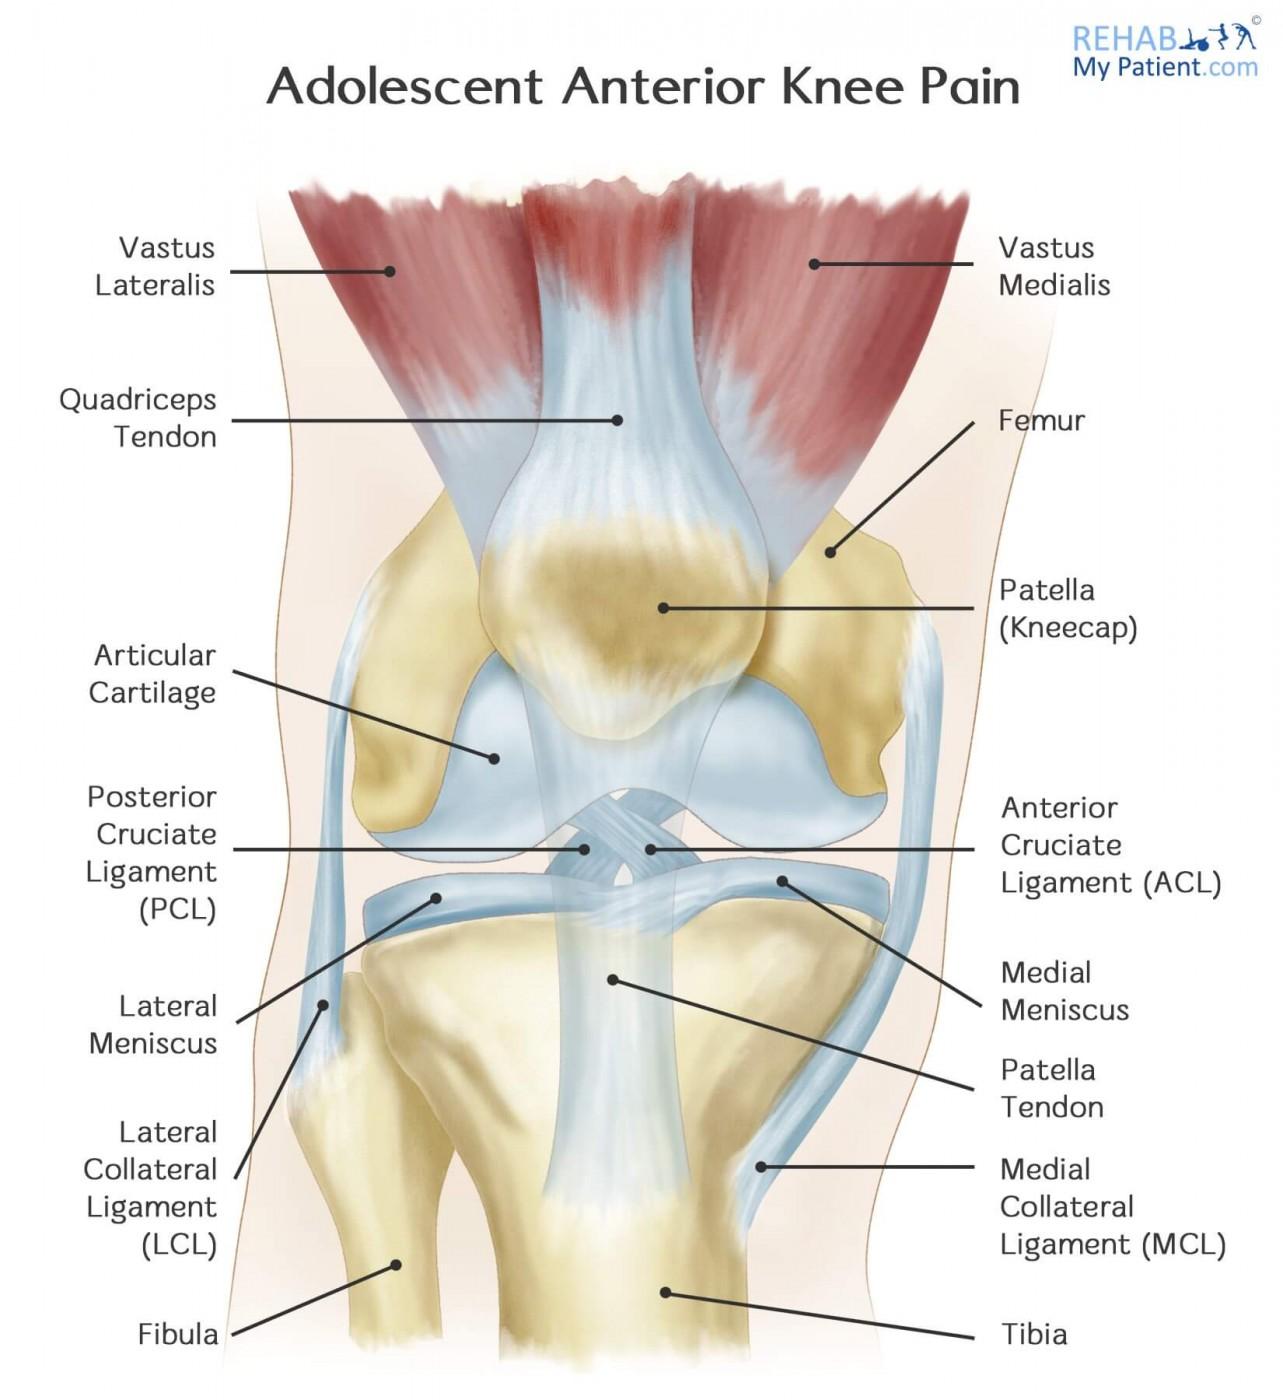 Adolescent Anterior Knee Pain Rehab My Patient